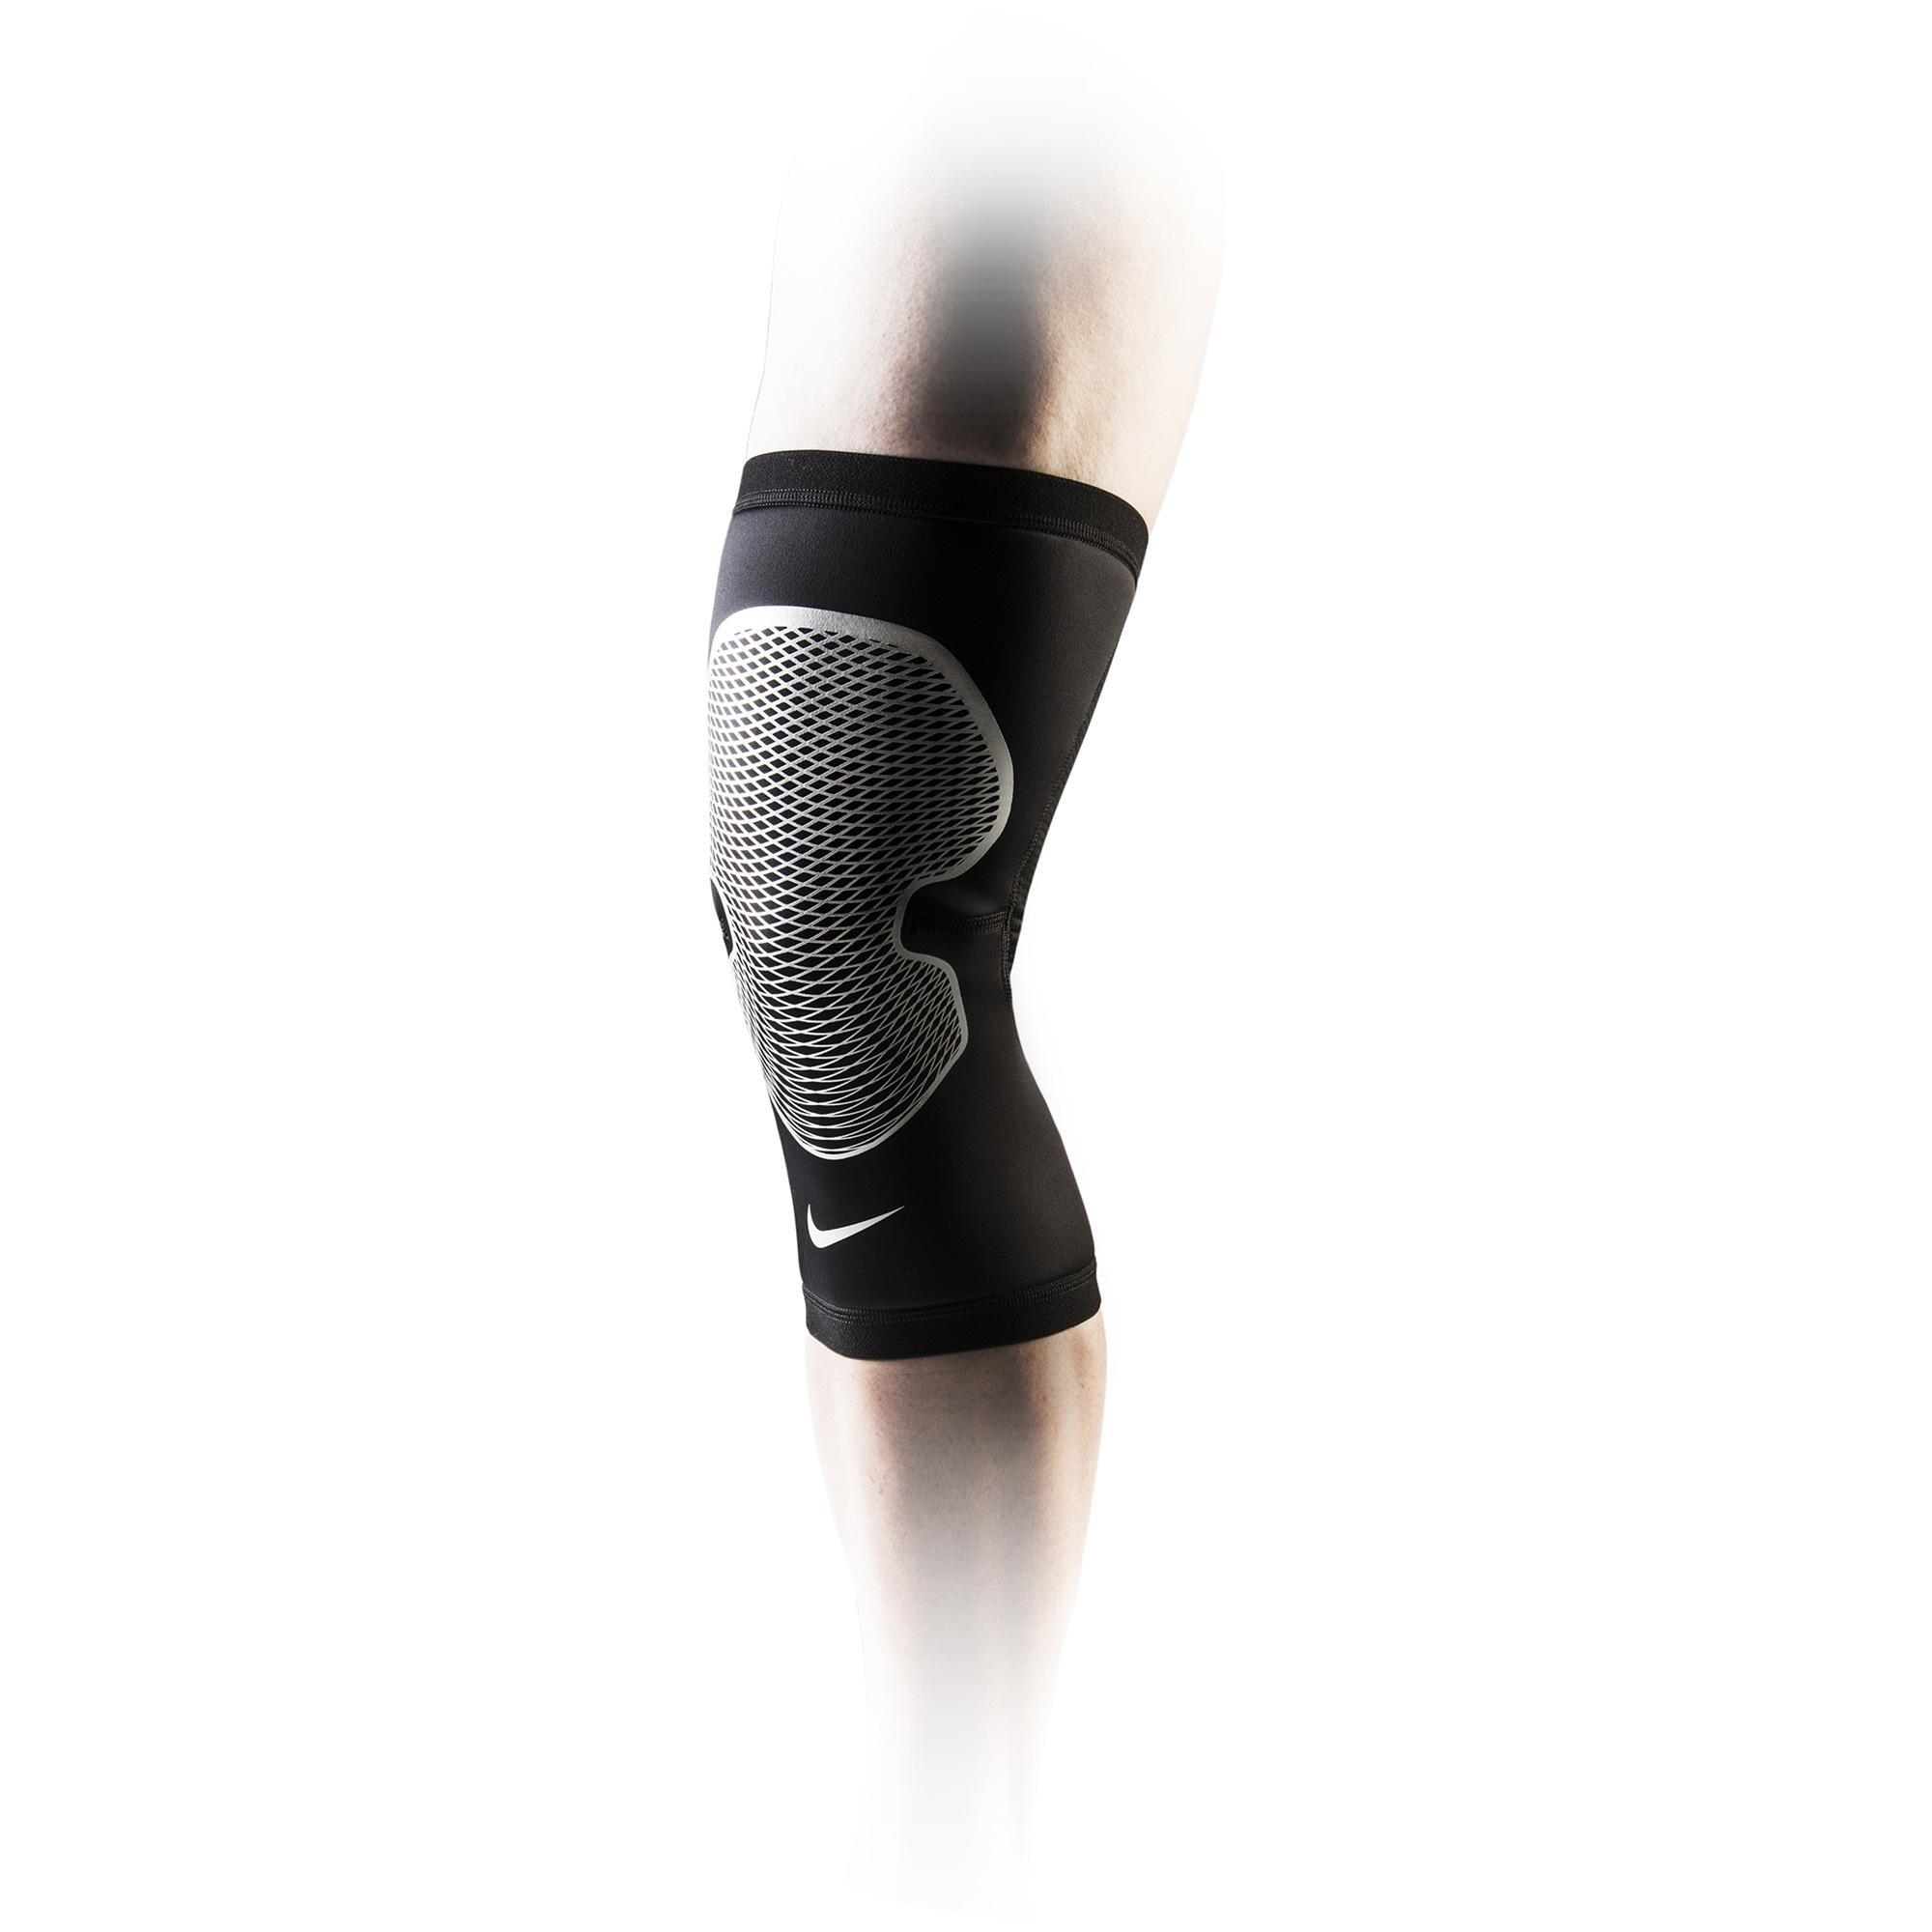 55c46362d3 Nike Pro Hyperstrong Knee Sleeve 2.0 - Black - Tennisnuts.com